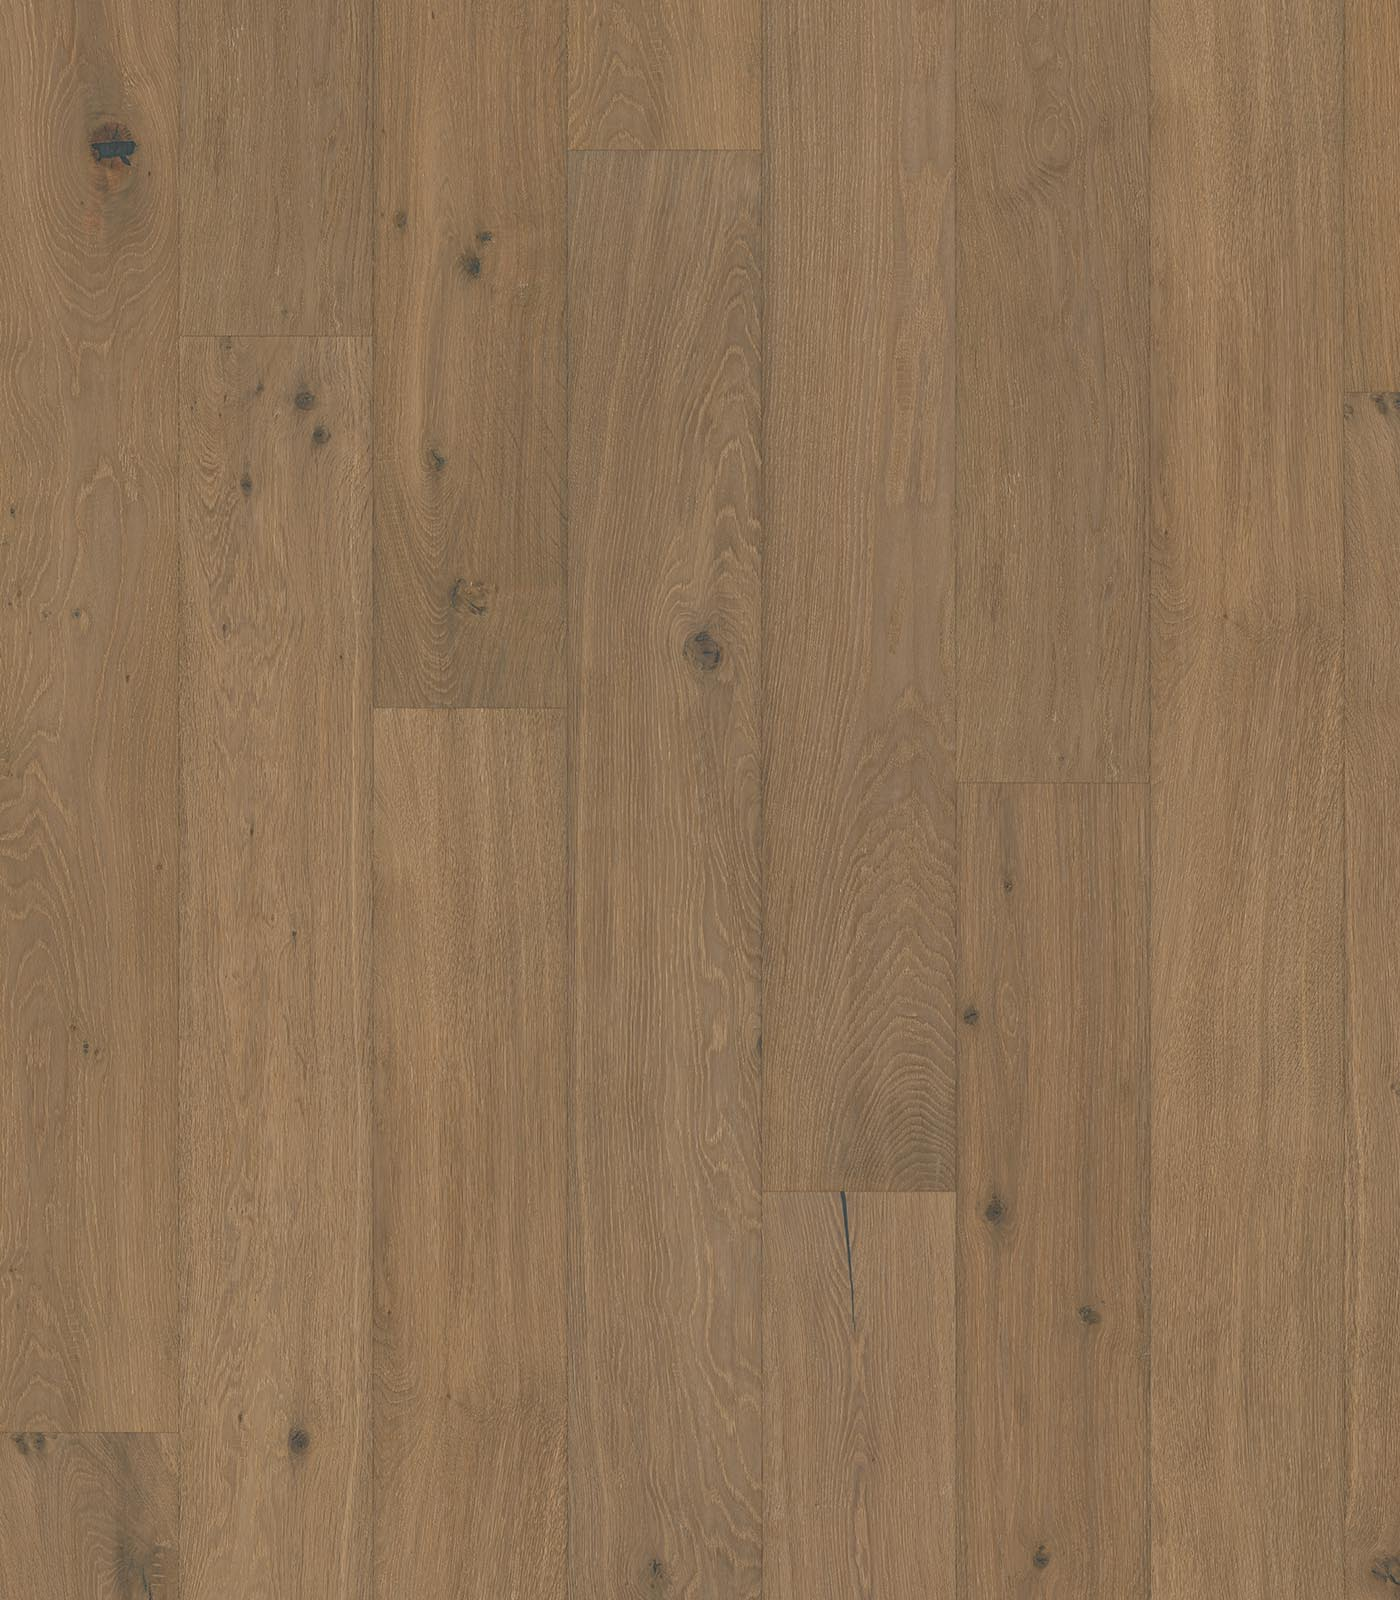 Jungfrau-Antique Collection-European Oak Floors-flat